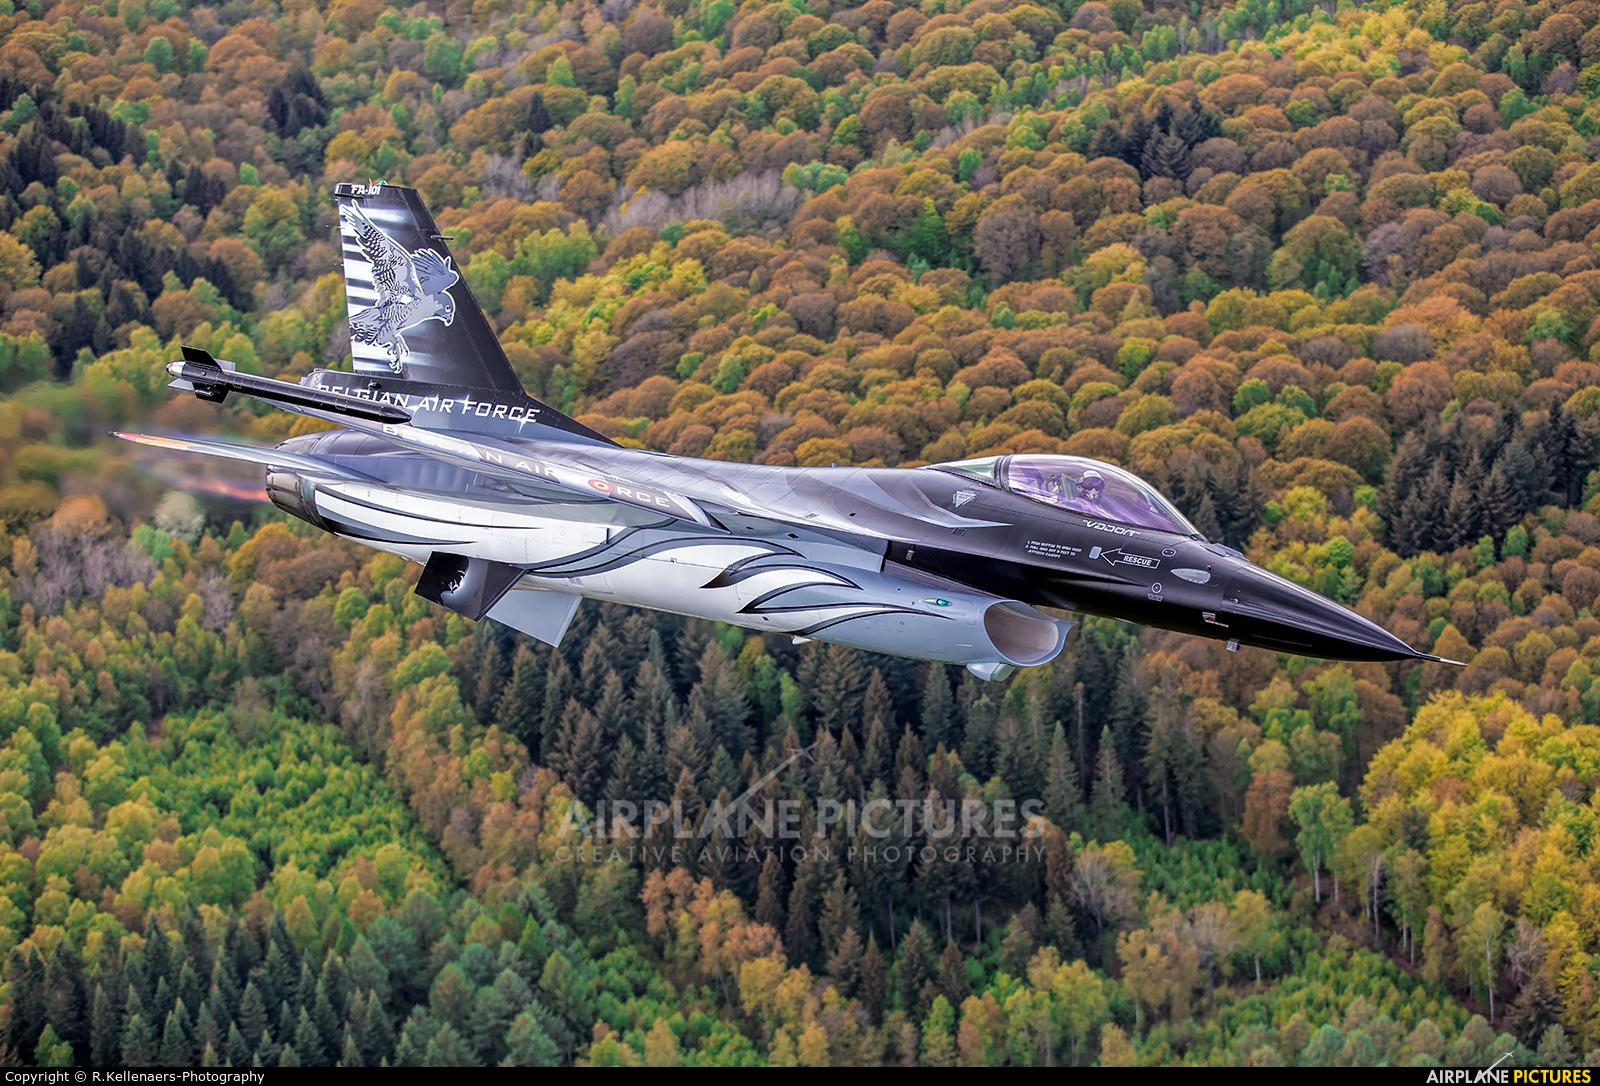 Belgium - Air Force FA-101 aircraft at In Flight - Belgium